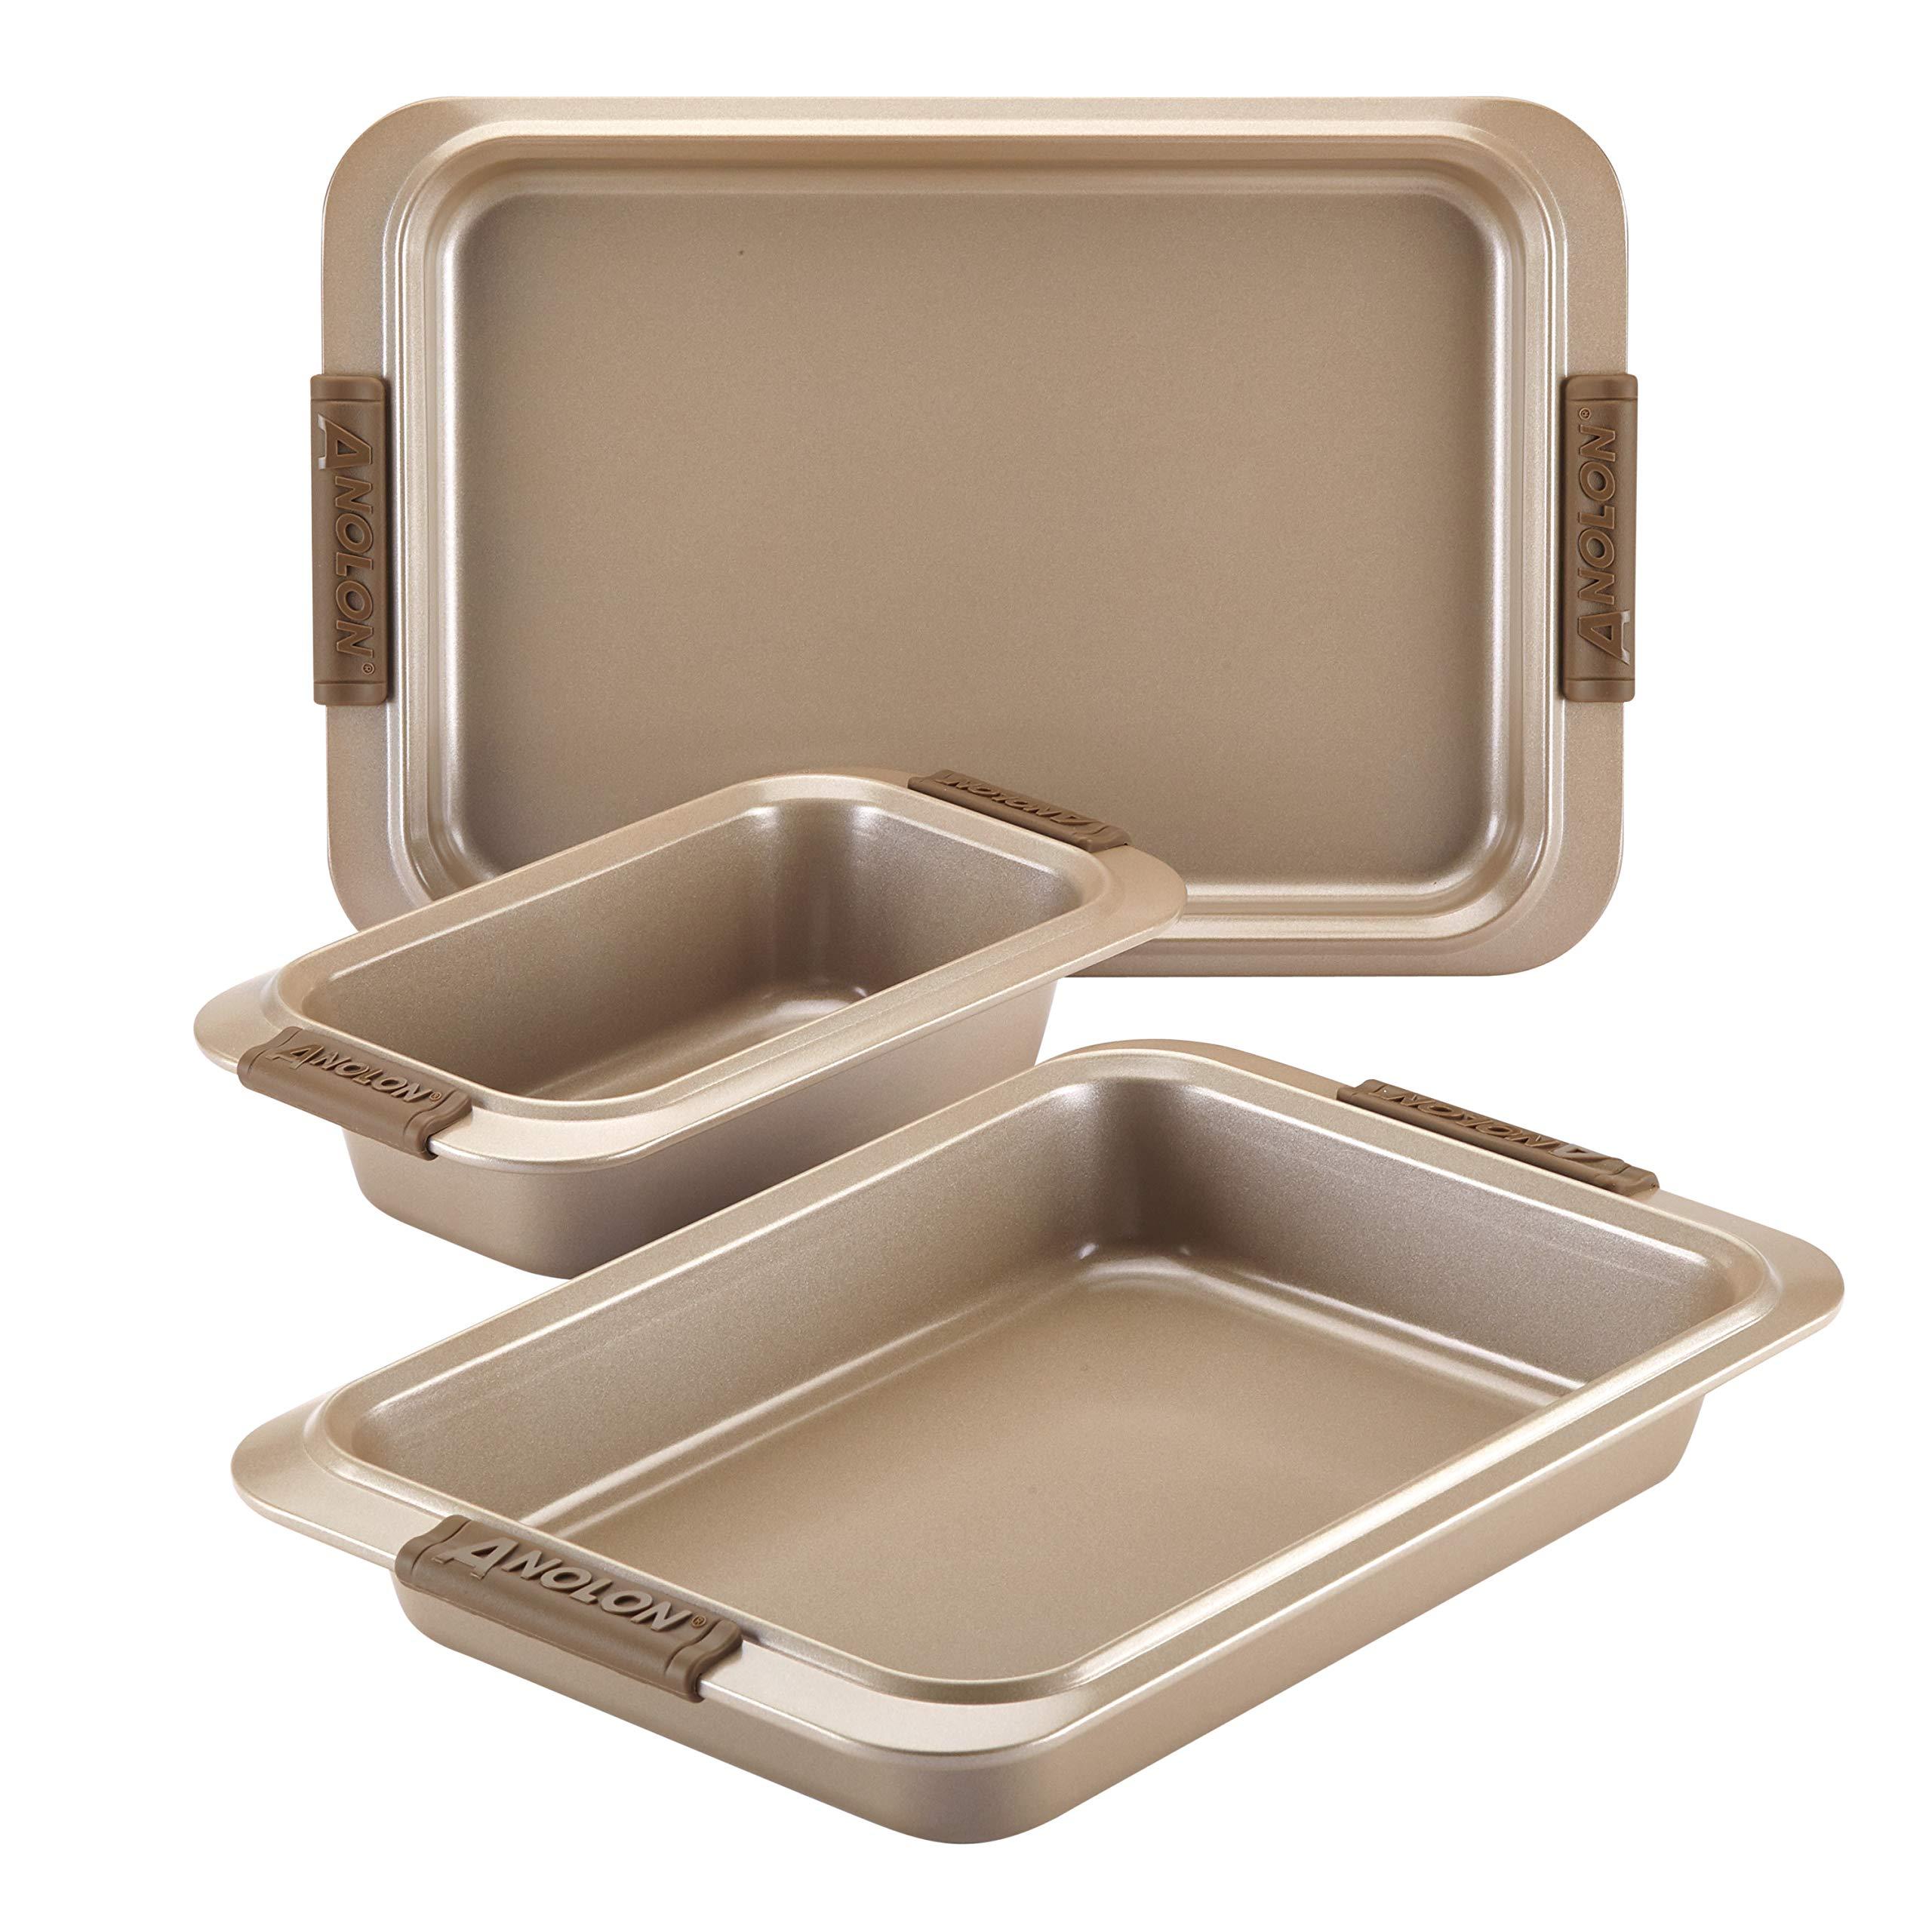 Anolon 47395 3-Piece Steel Bakeware Set, Bronze